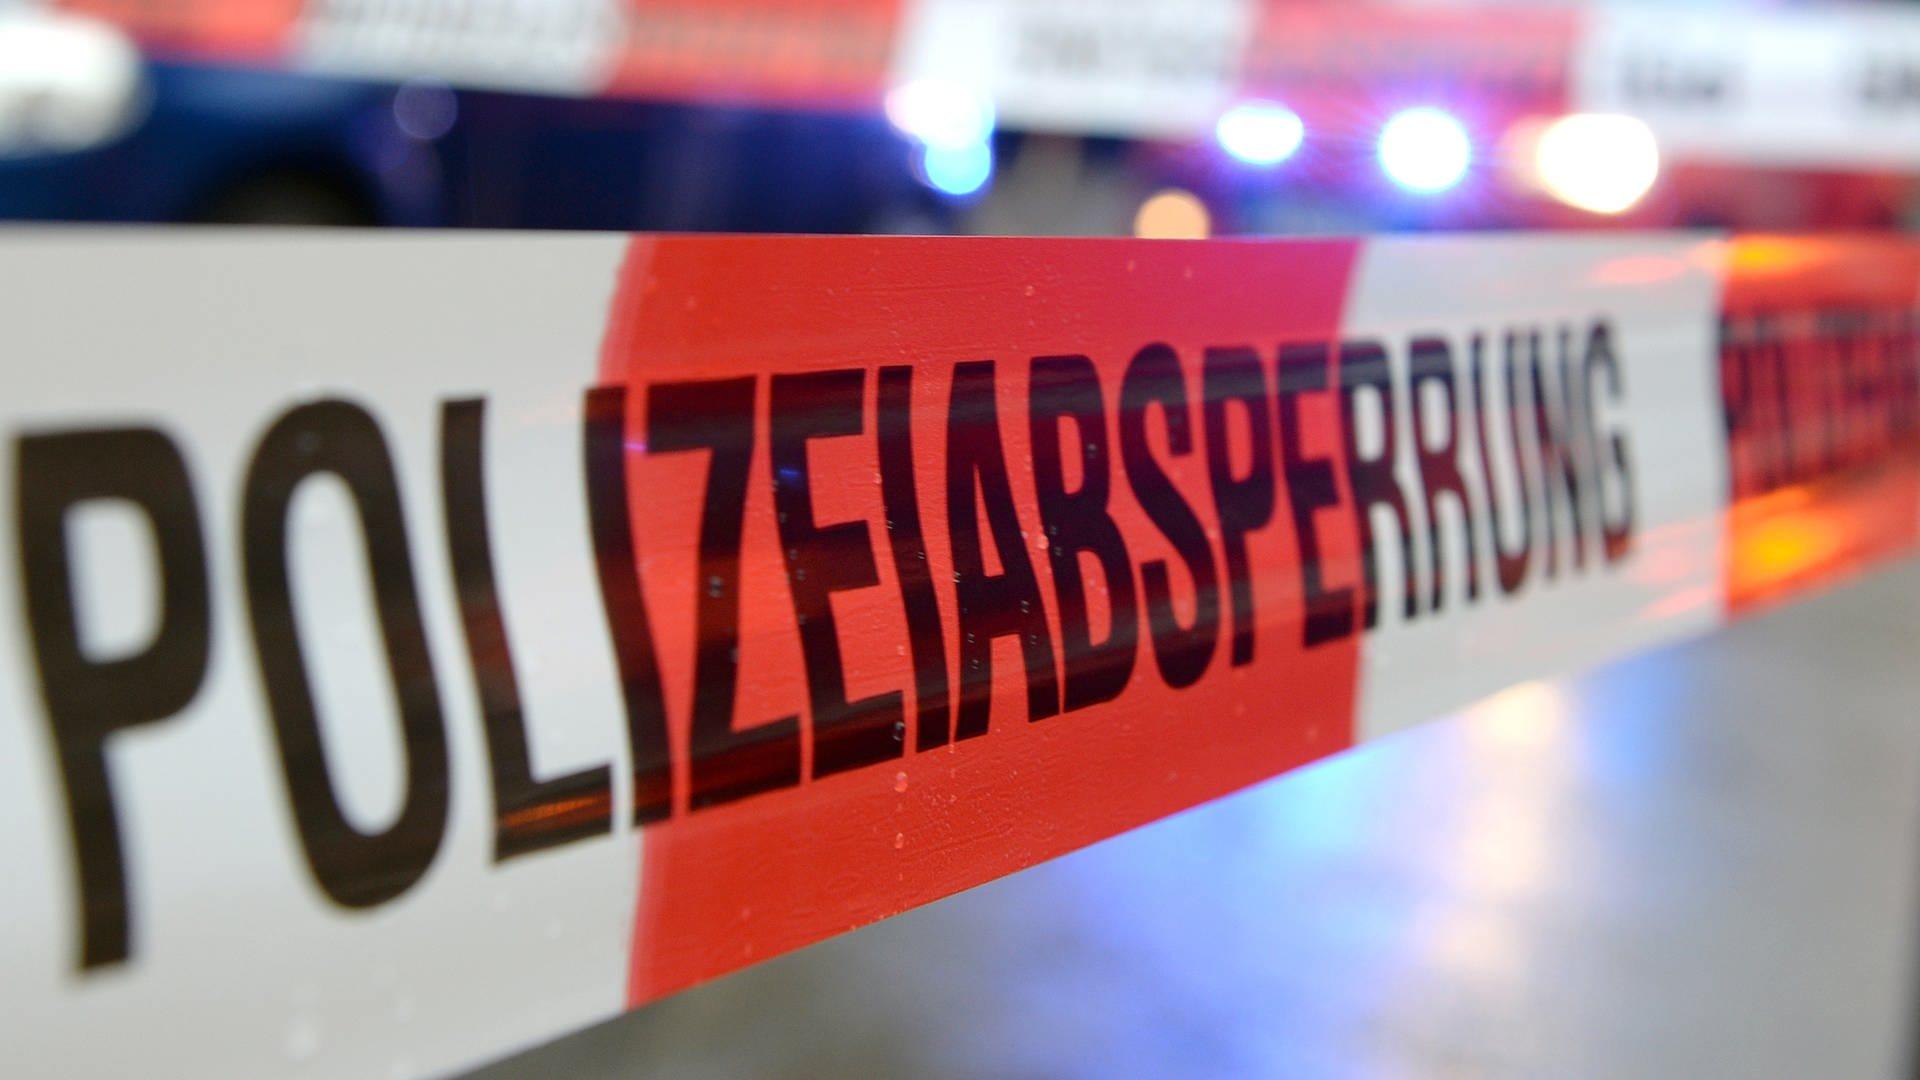 31-Jähriger mit Messer getötet